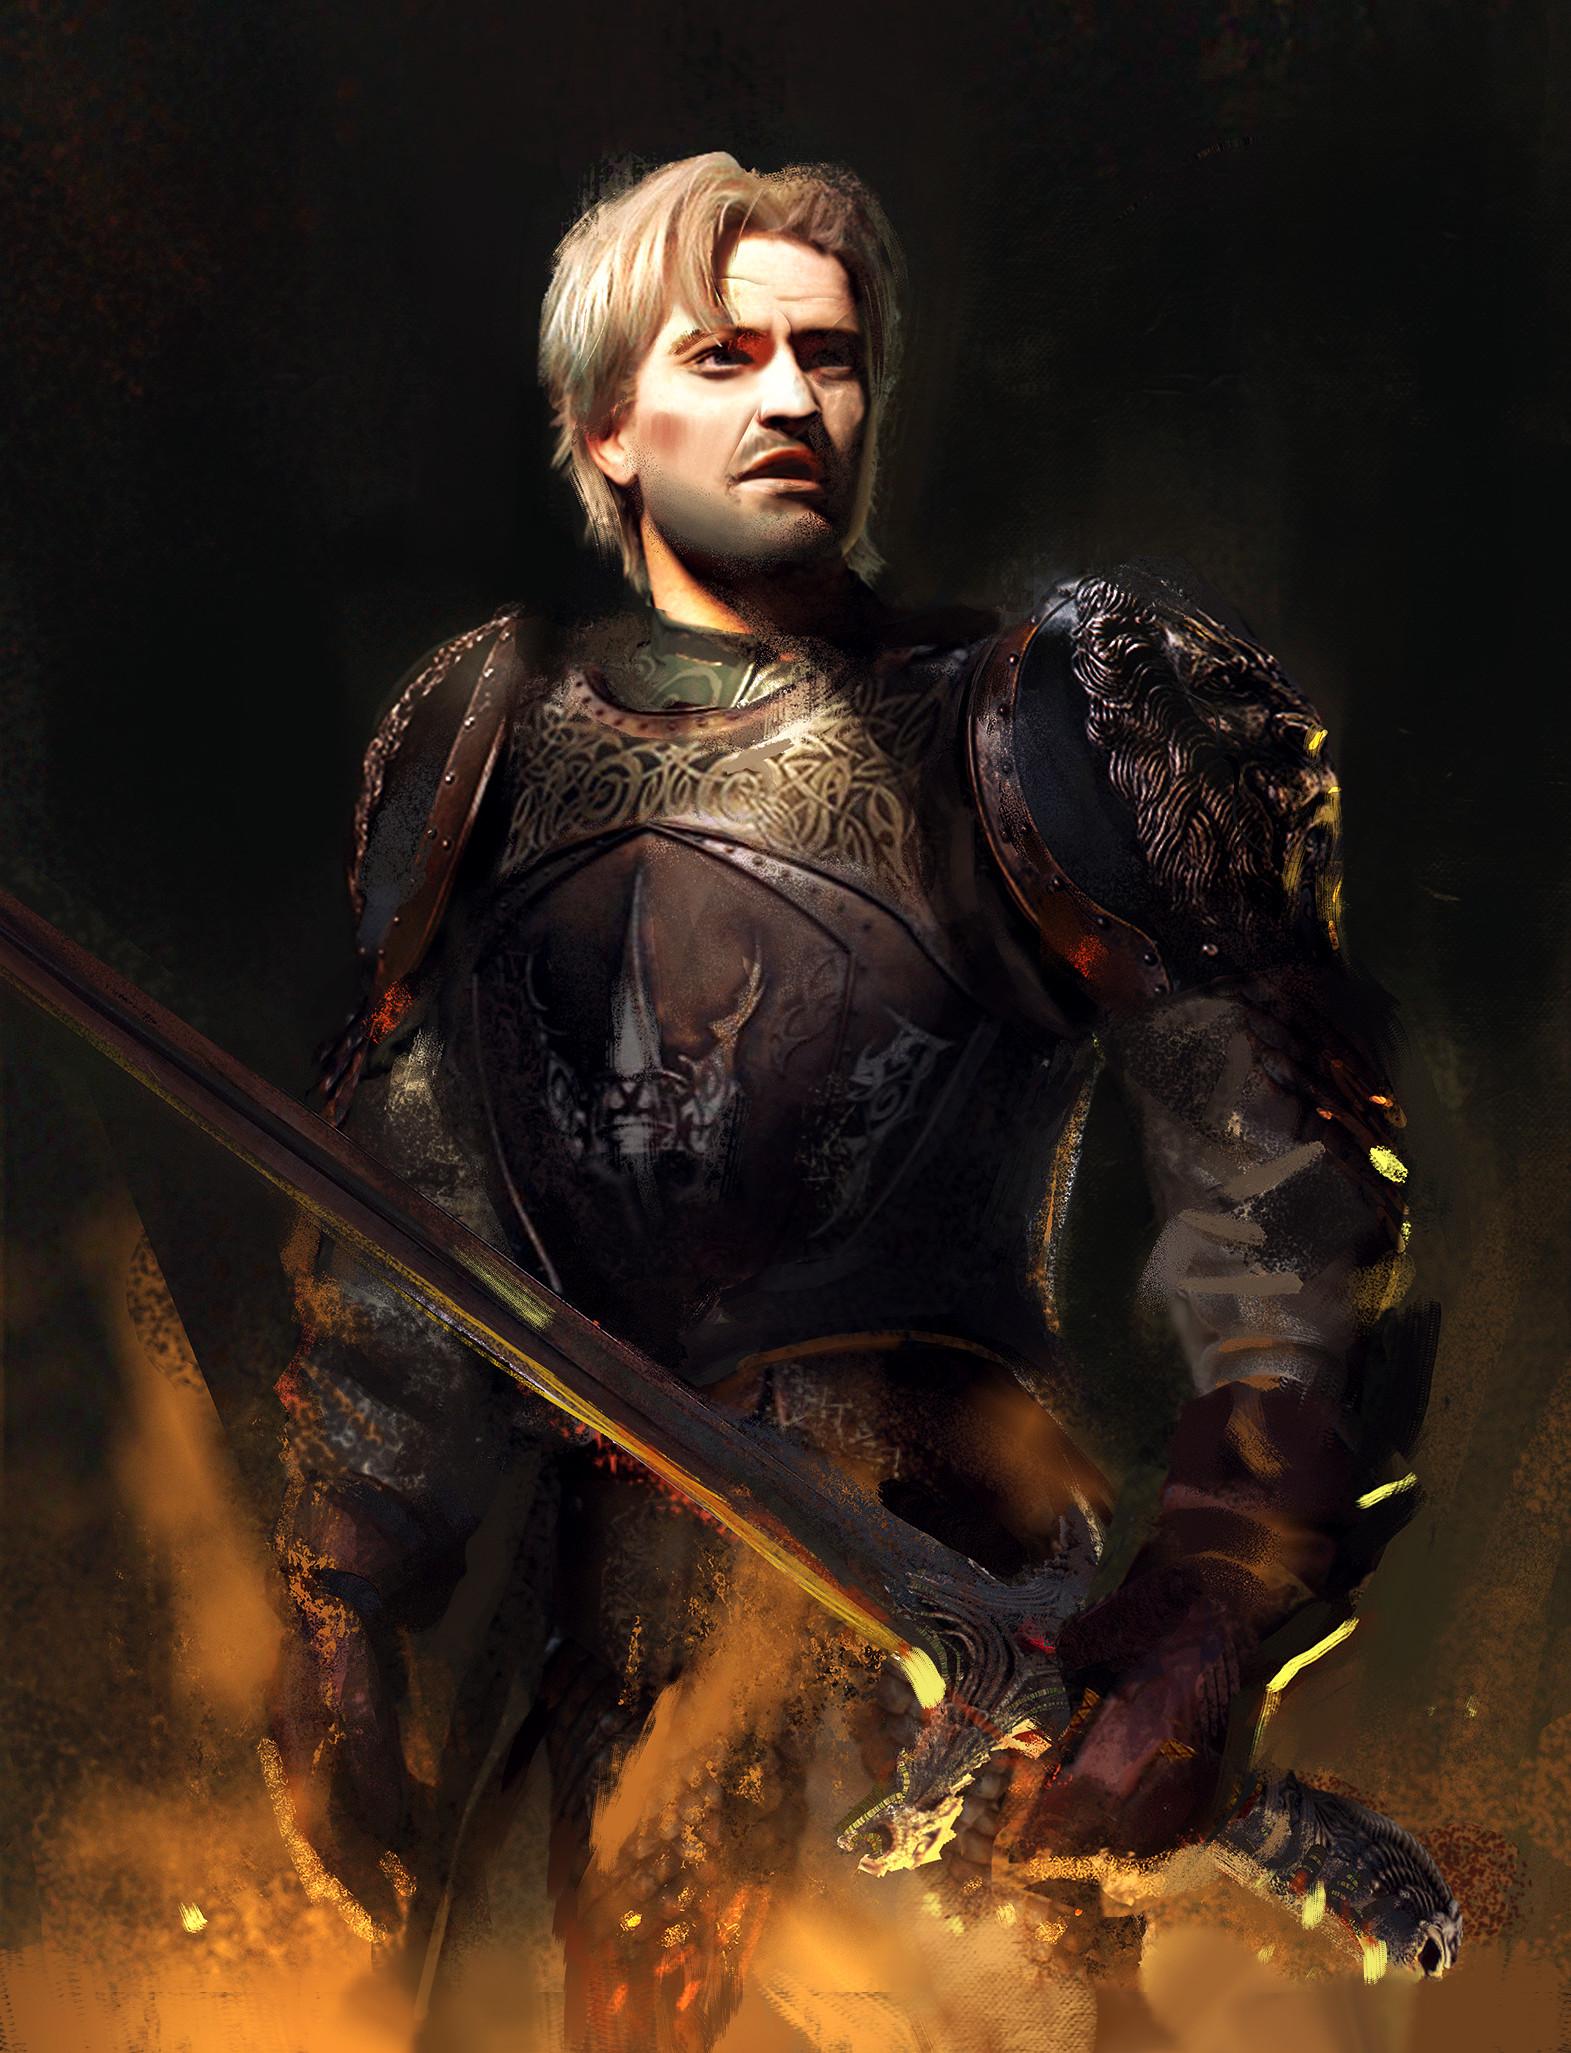 ArtStation Jaime Lannister Fan Art Marta Danecka